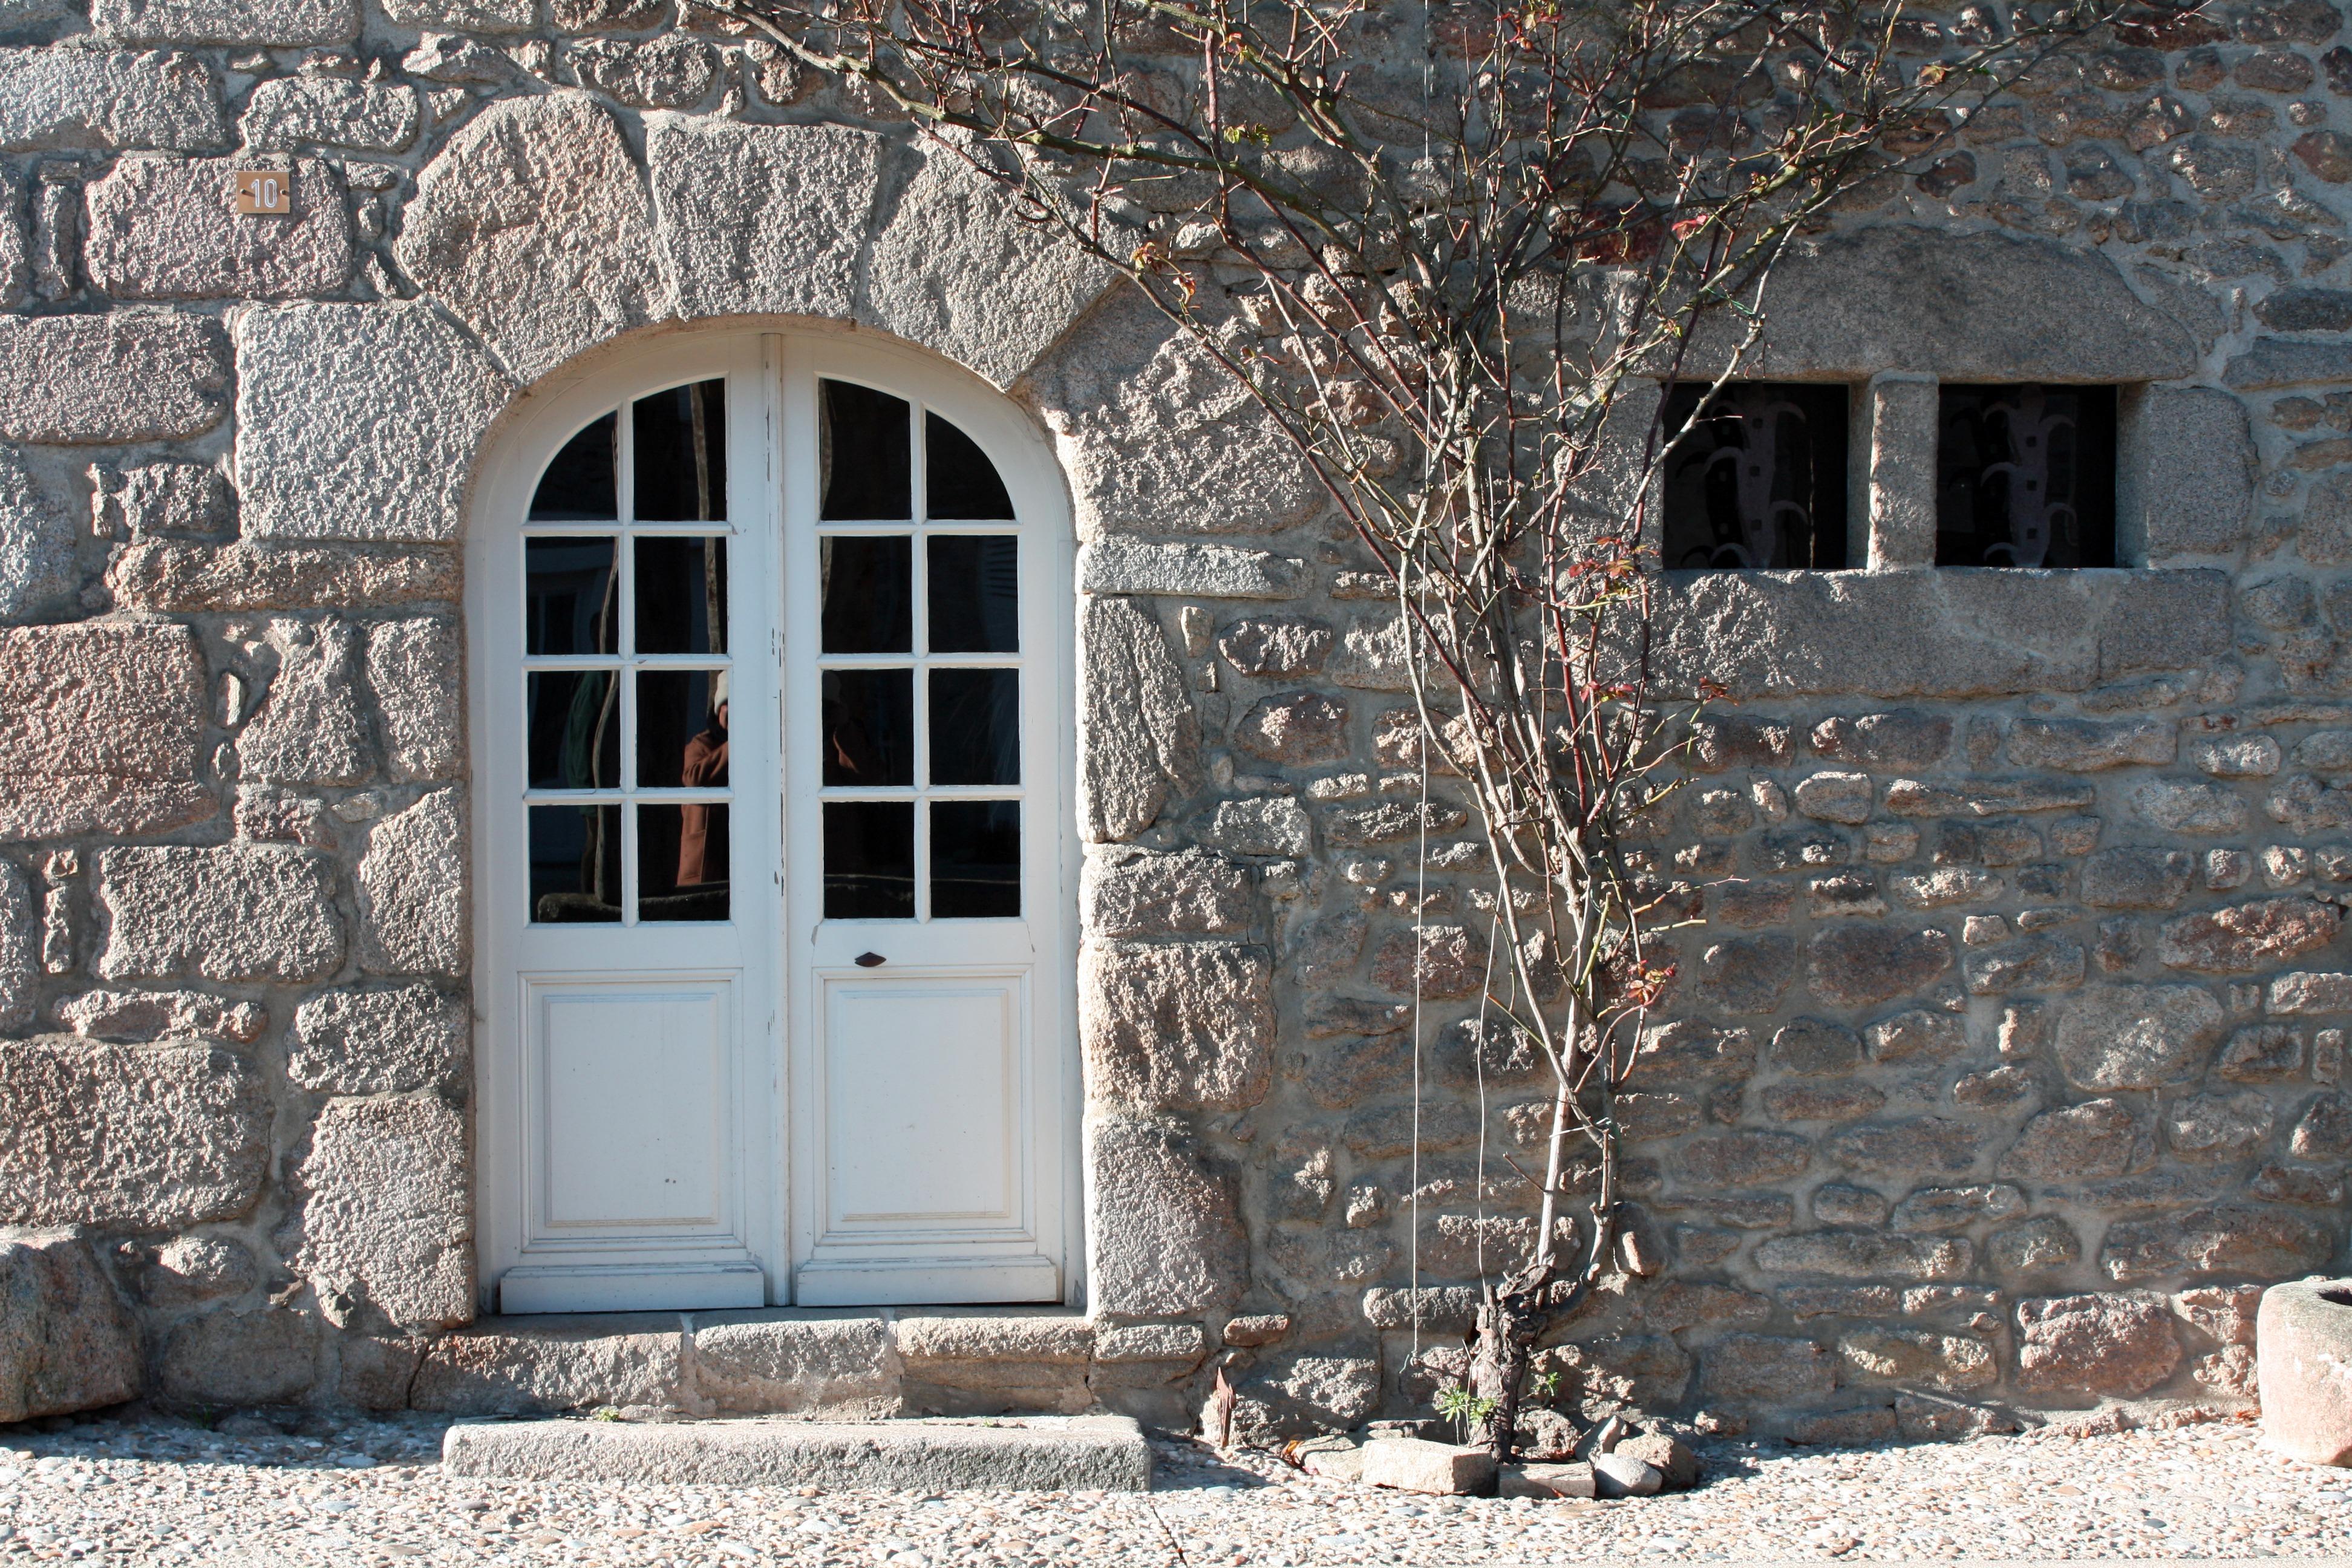 Fotos Gratis Arquitectura Casa Ventana Antiguo Pared